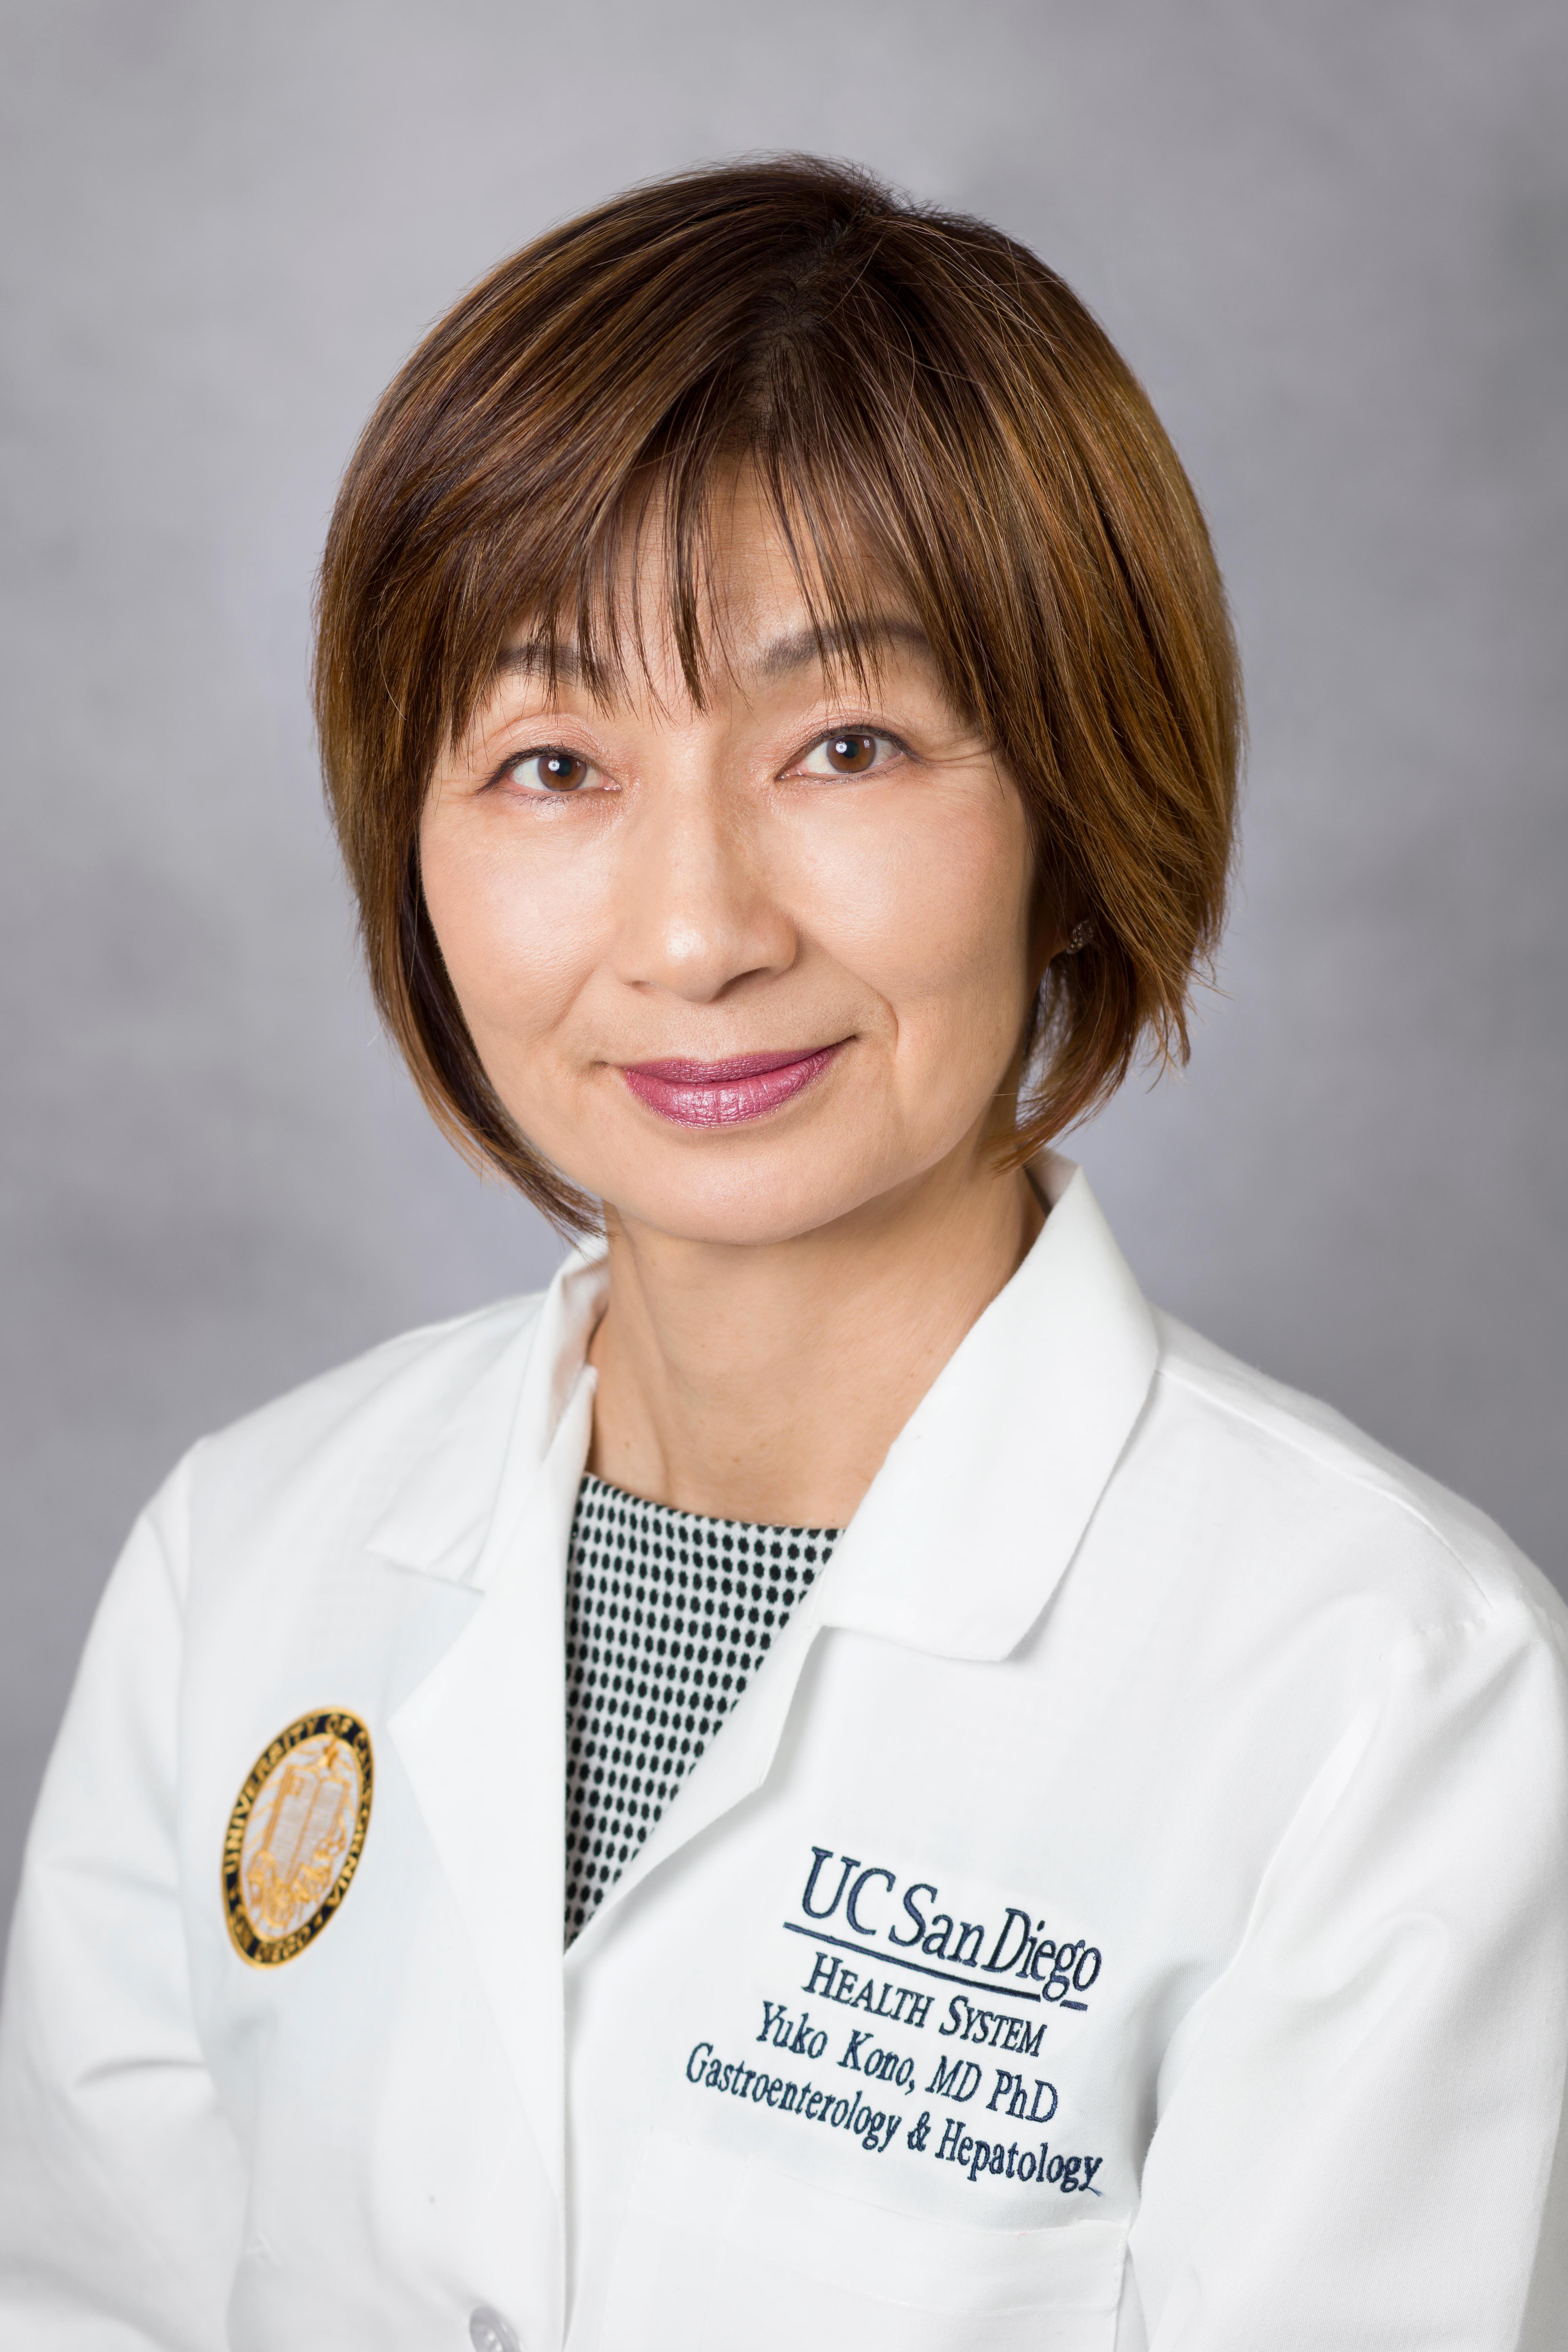 Yuko Kono, MD, PhD 4510 Executive Dr, San Diego, CA 92121